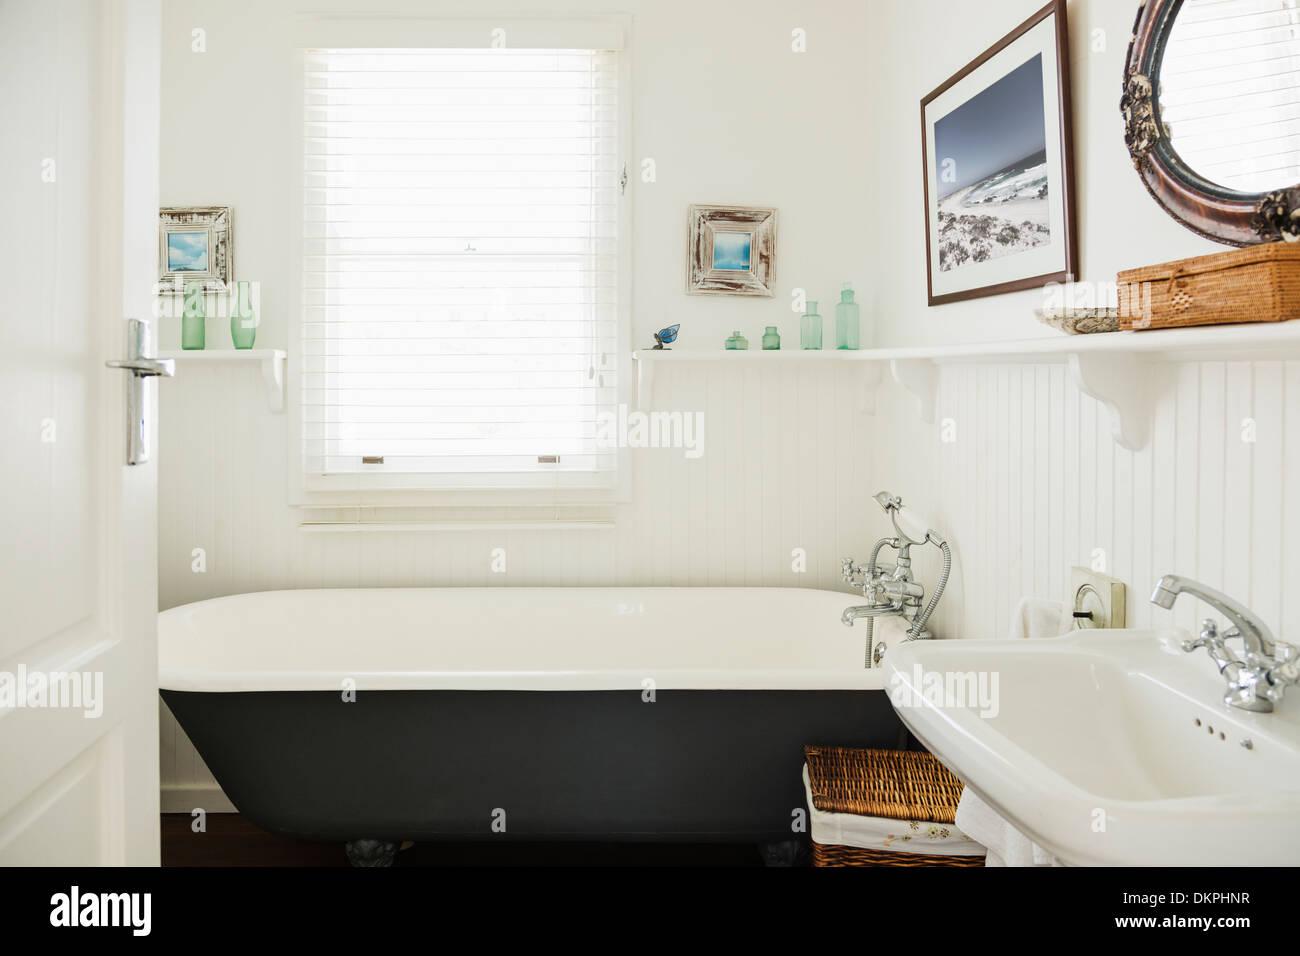 Claw Foot Bathtub Stock Photos & Claw Foot Bathtub Stock Images - Alamy